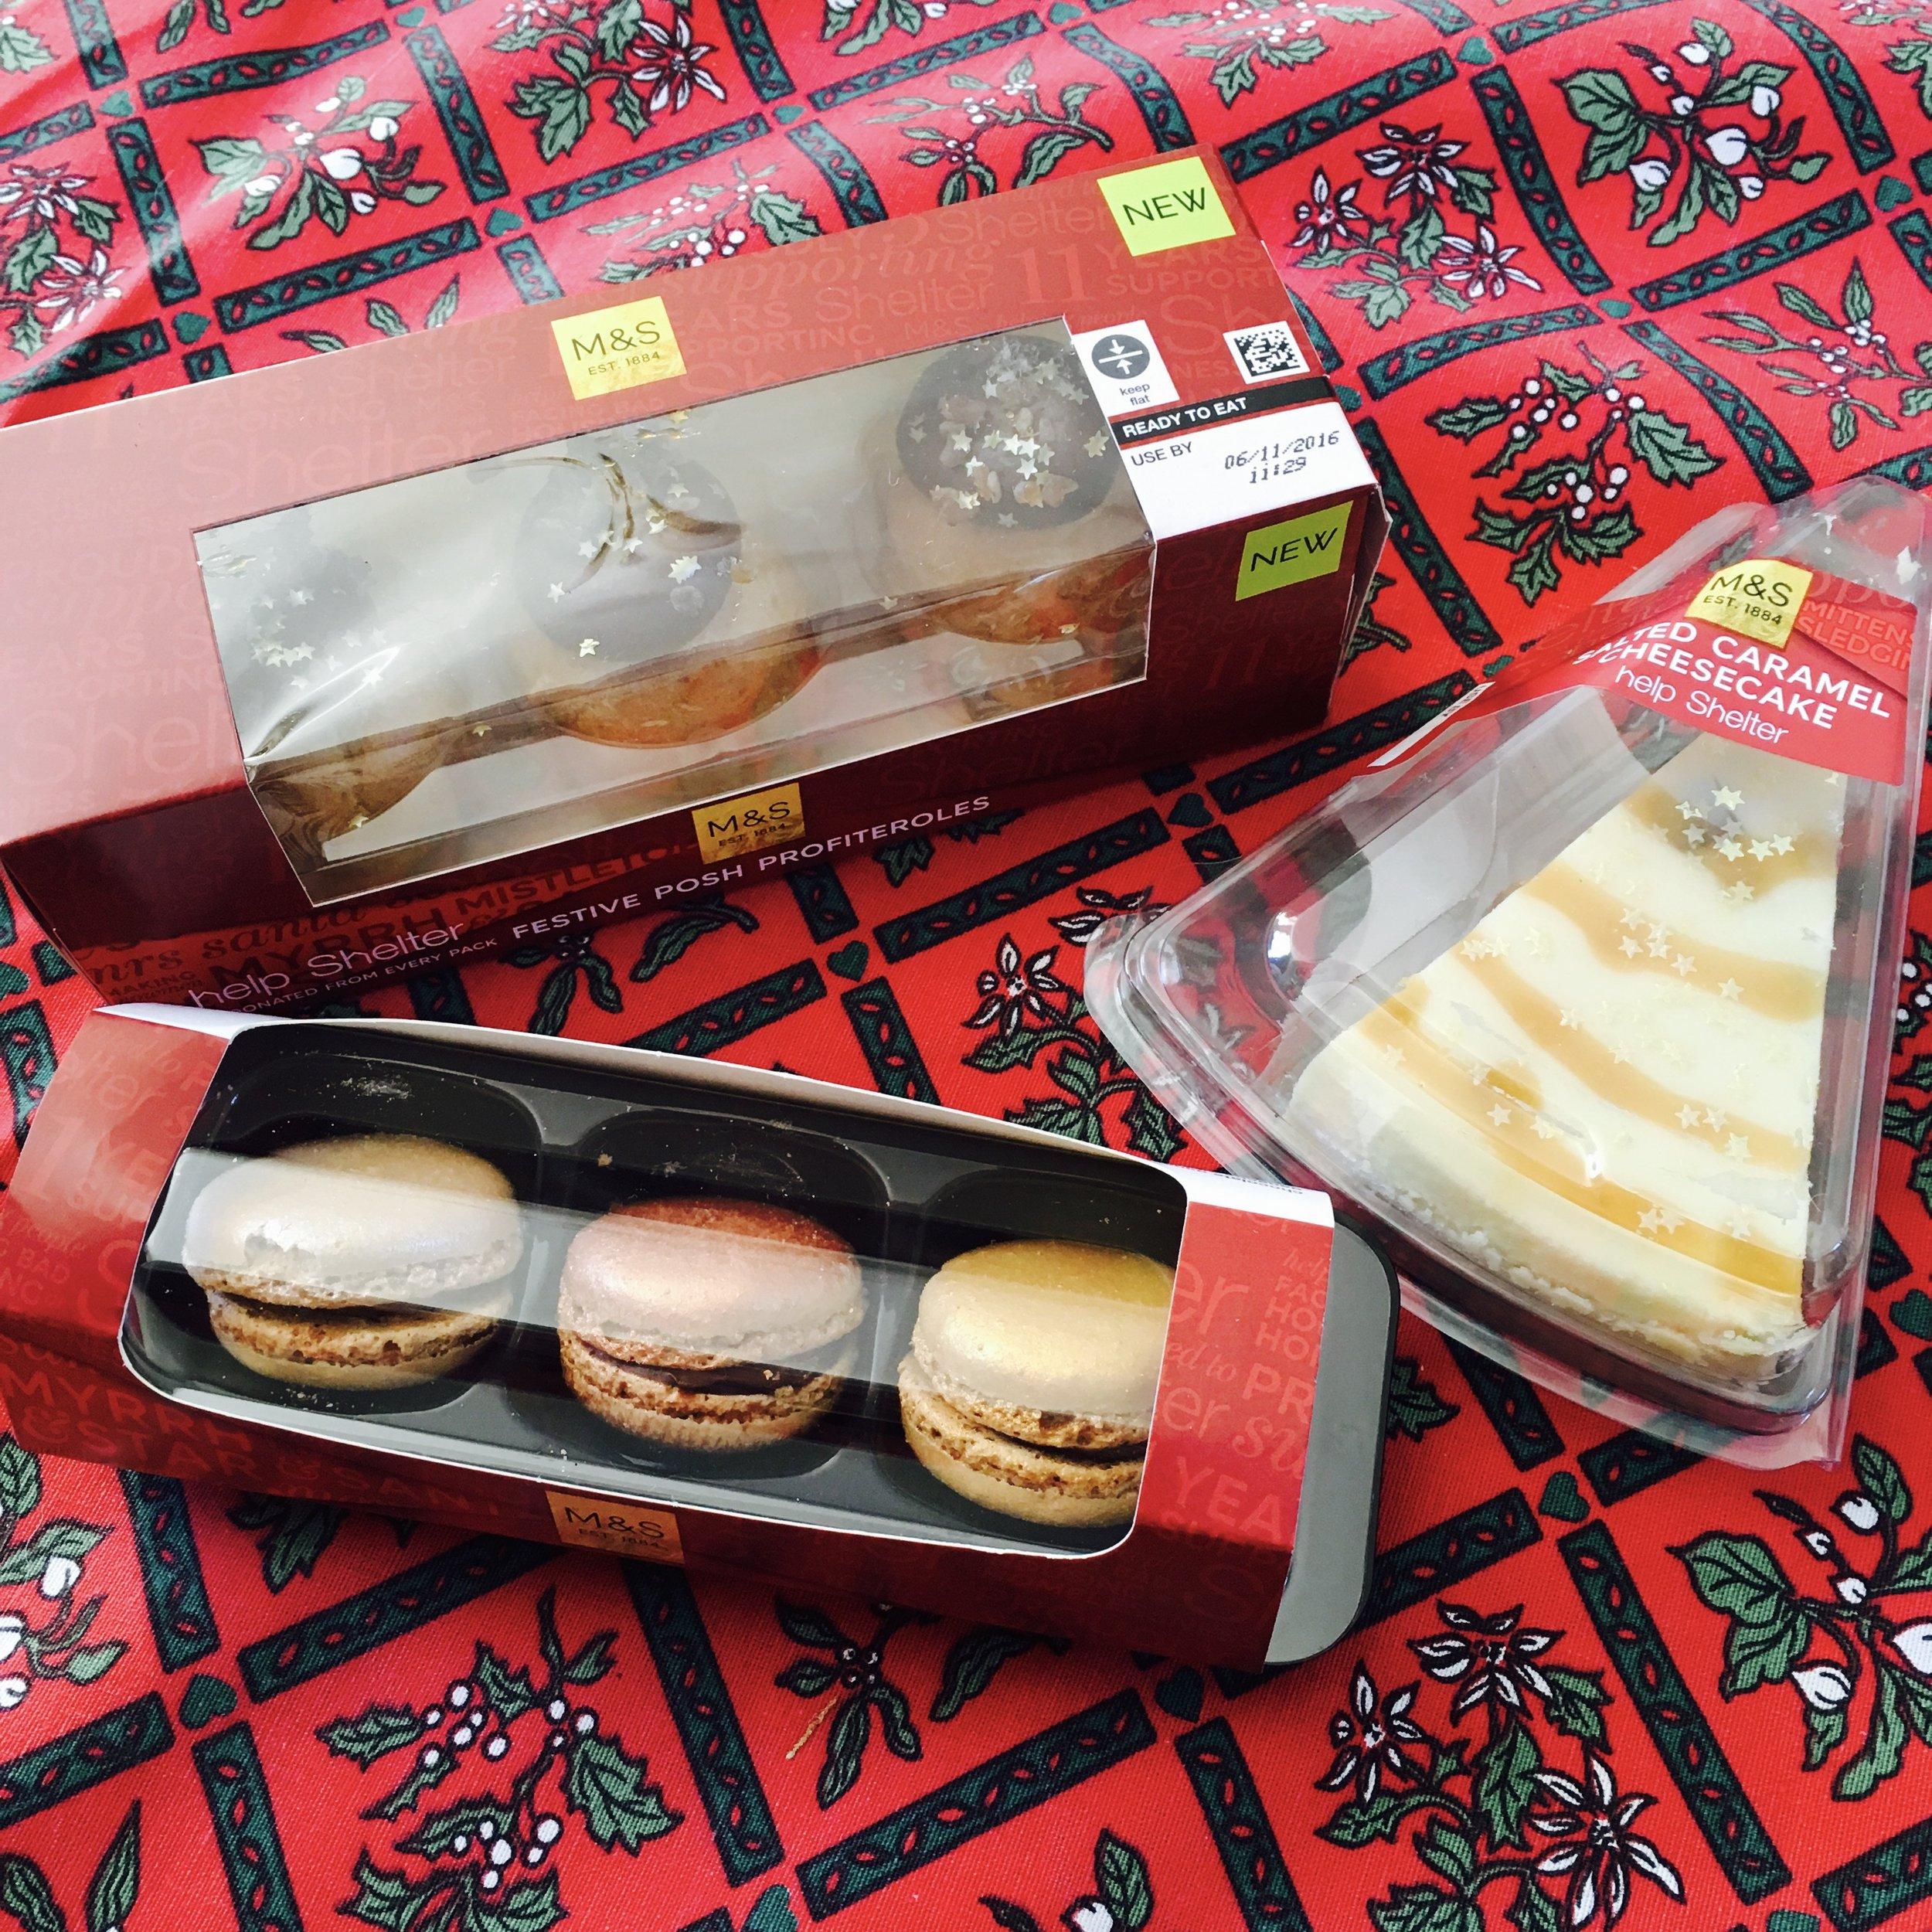 Profiteroles £2 : Cheesecake £2 : Macaroons £1.75